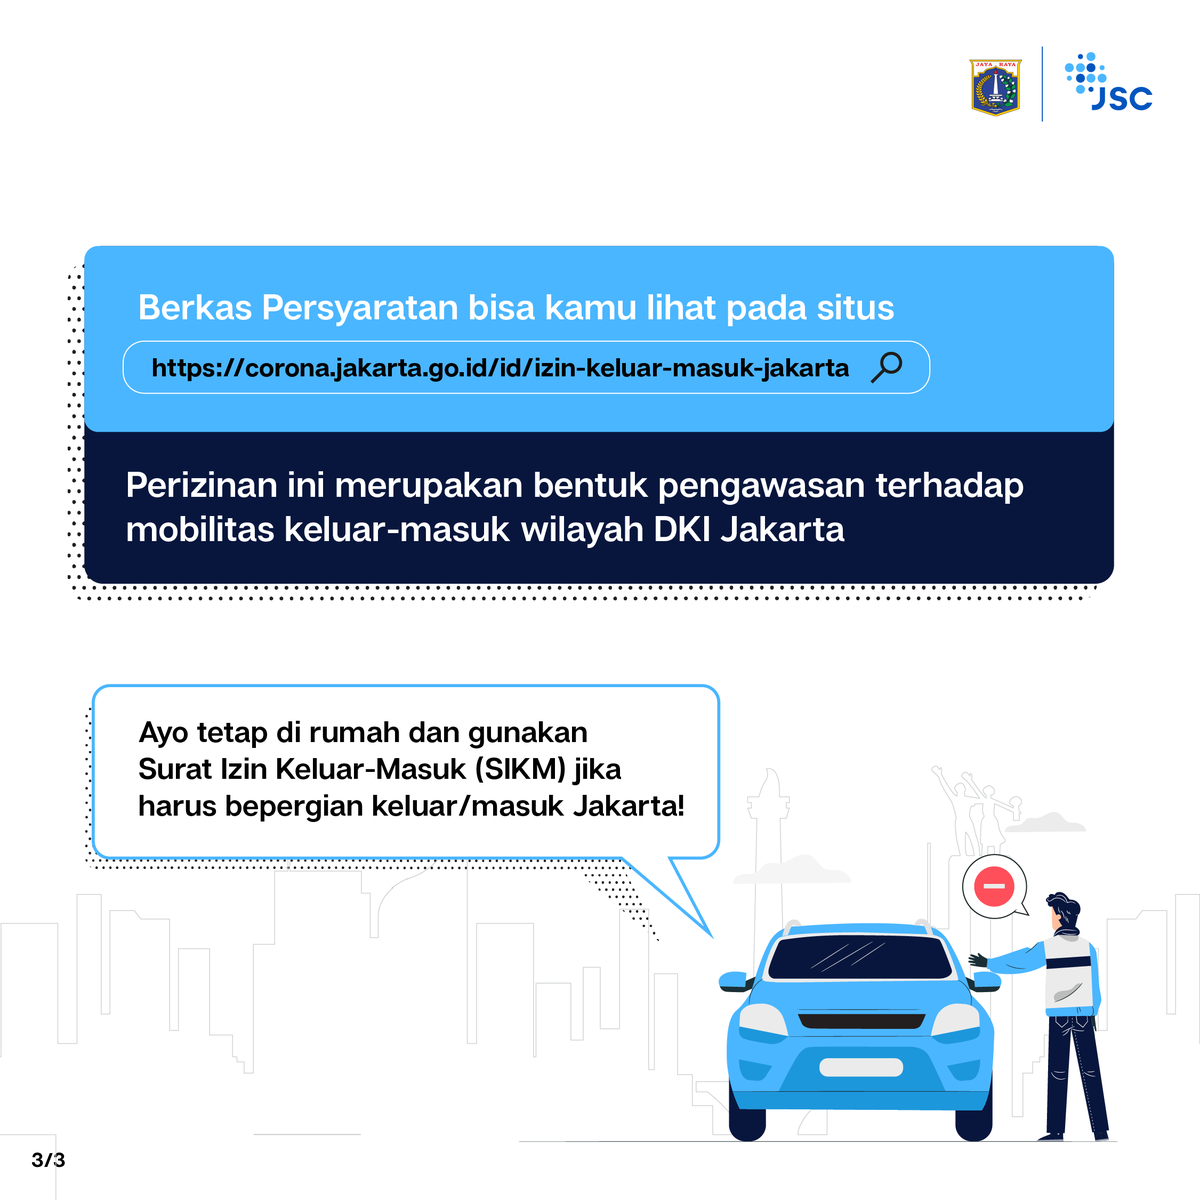 Jsclounge على تويتر Selama Masa Pandemi Covid 19 Warga Non Jabodetabek Yang Ingin Memasuki Wilayah Dki Jakarta Memerlukan Surat Izin Keluar Masuk Sikm Kamu Bisa Mengurus Dan Melihat Berkas Persyaratan Sikm Jakarta Melalui Situs Https T Co